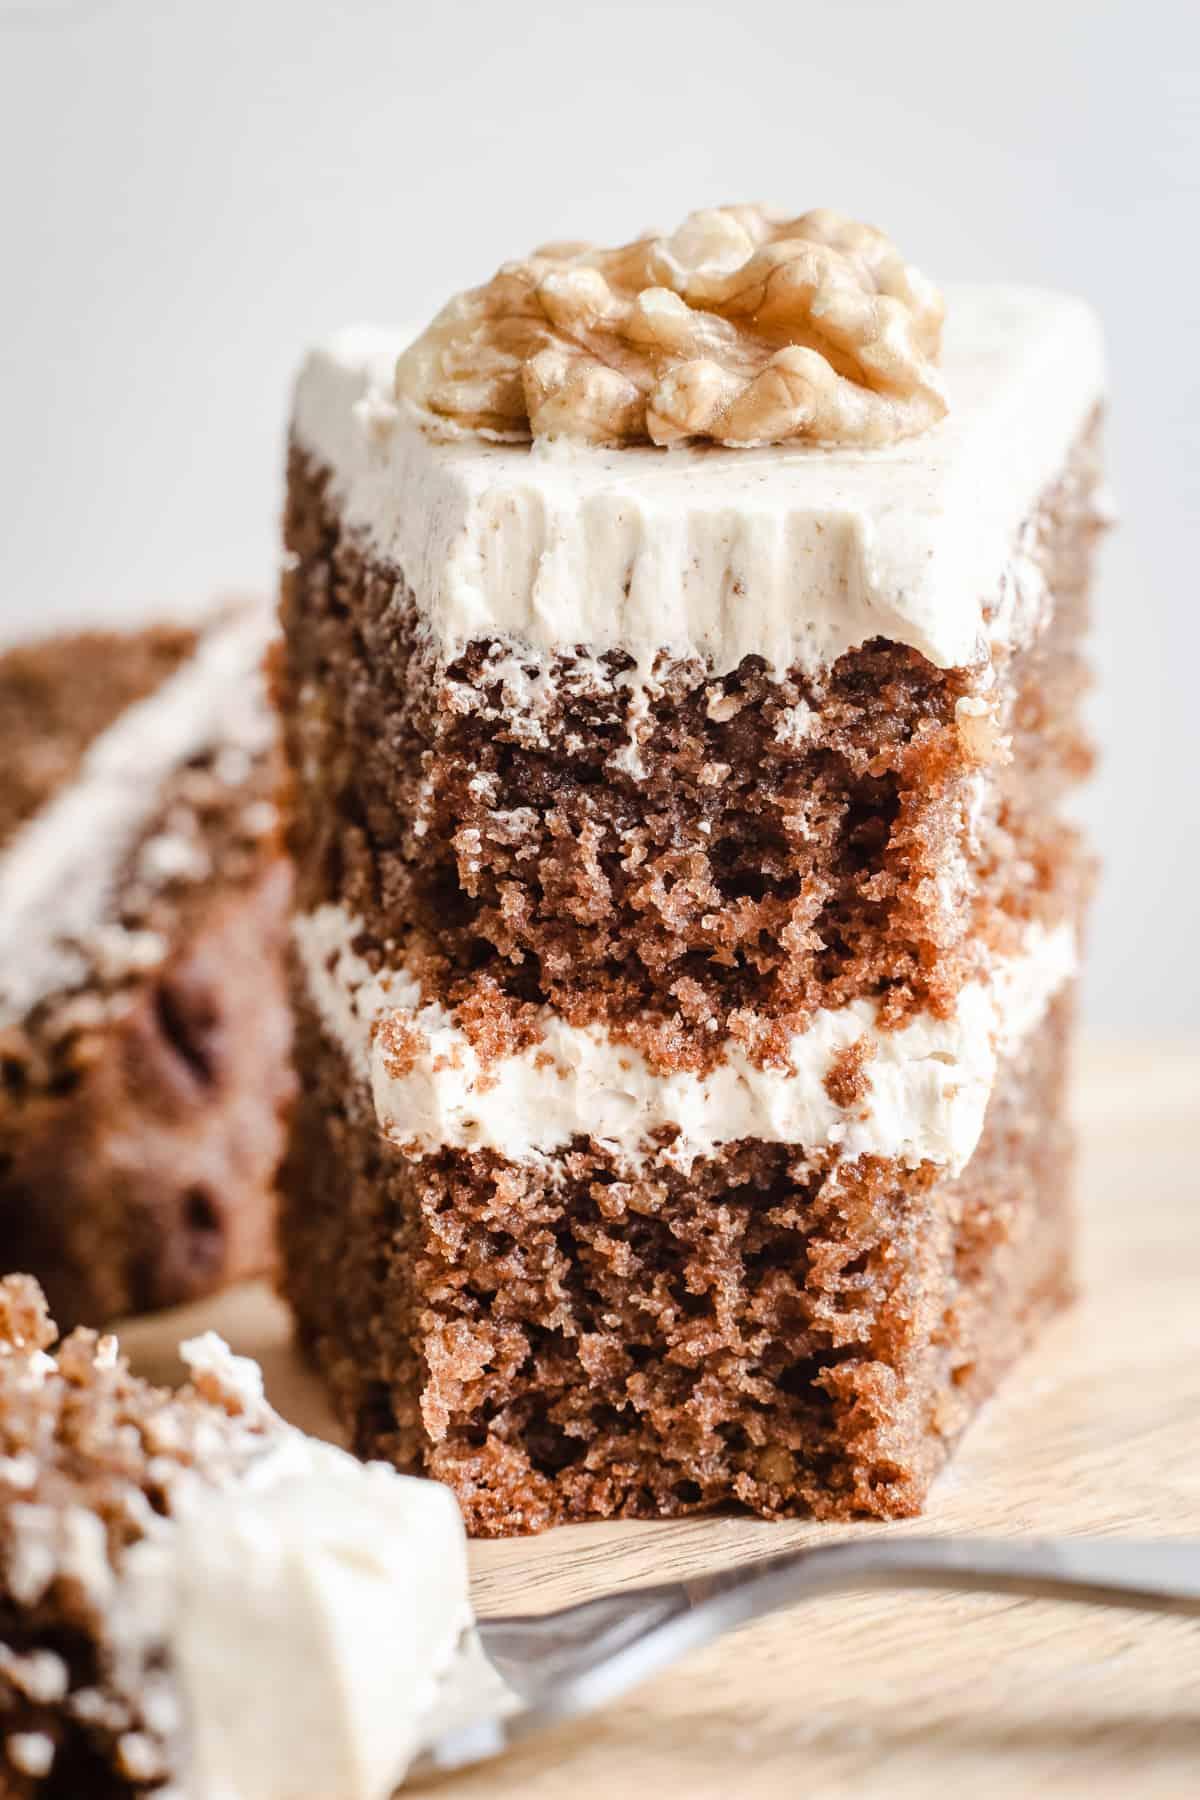 Cut slice of a gluten-free Coffee and Walnut Cake